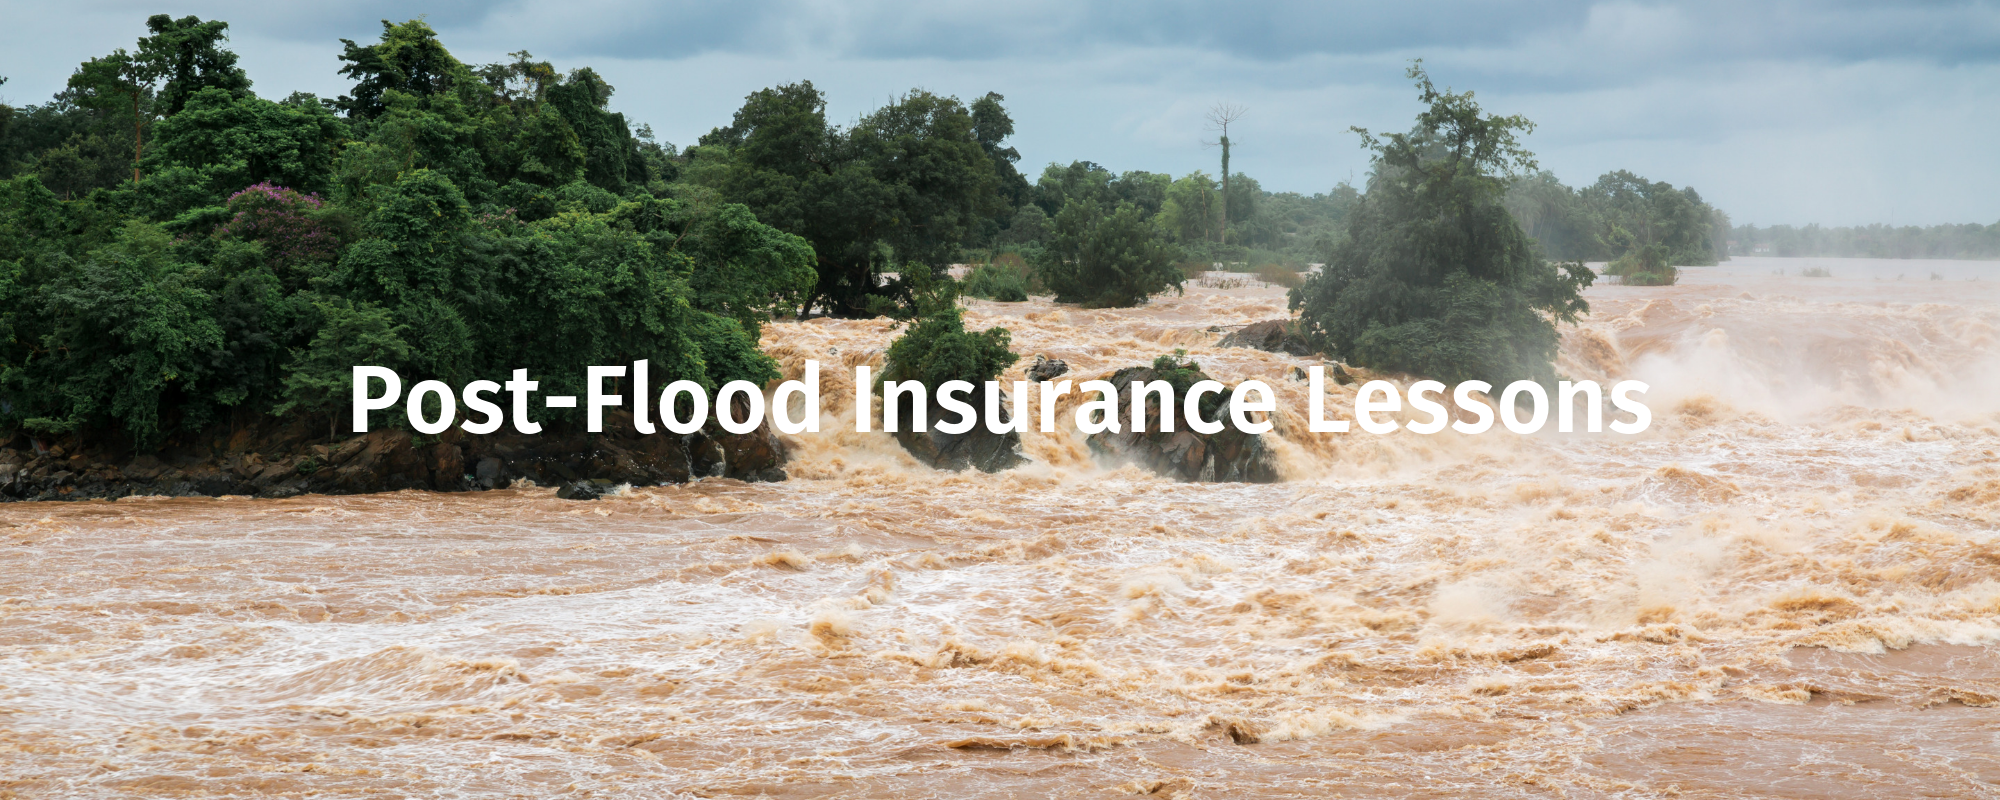 Post-Flood Insurance Lessons